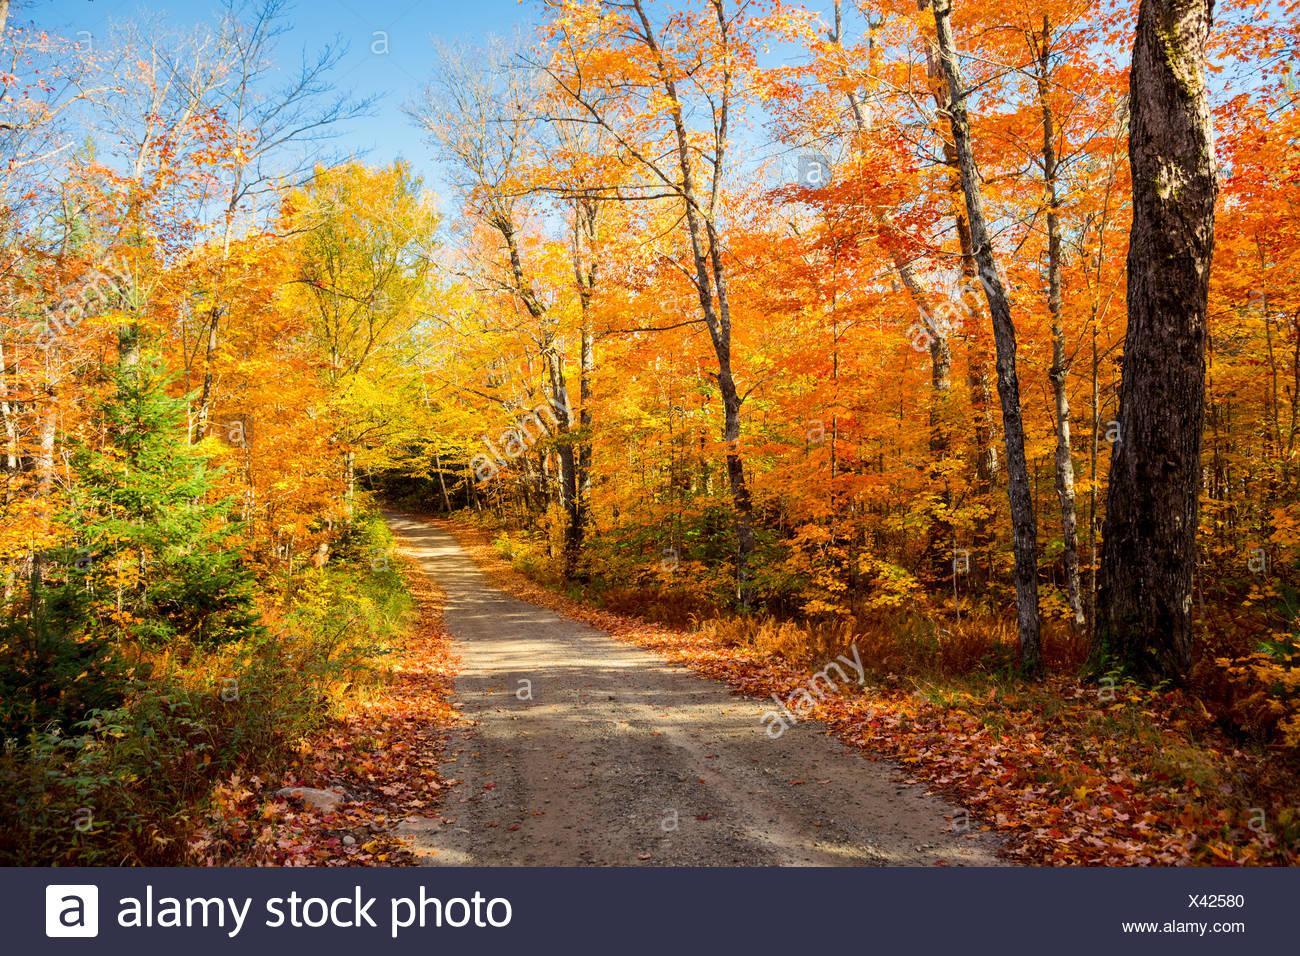 Fall foliage and clay road, Tea Lake, Algonquin Provincial Park, Ontario, Canada - Stock Image